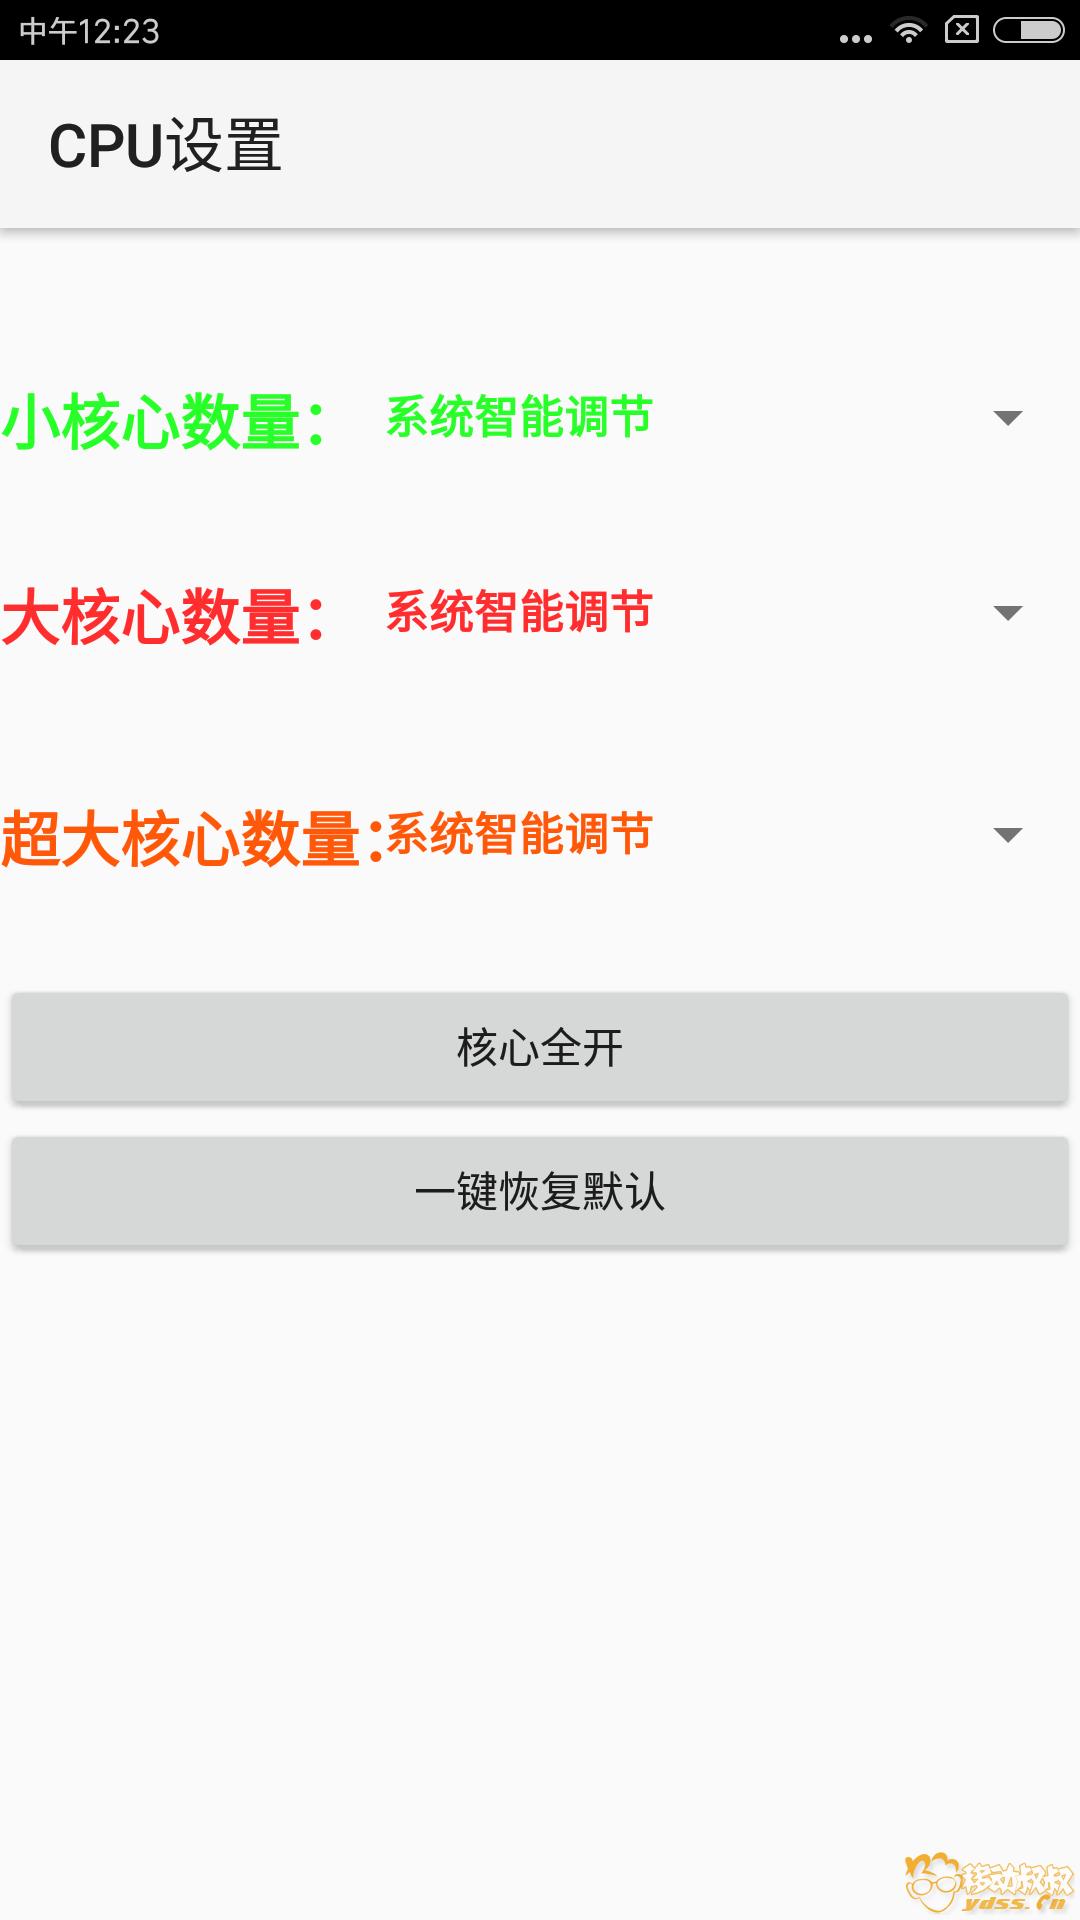 Screenshot_2017-06-18-12-23-56-226_com.eui.xd.png